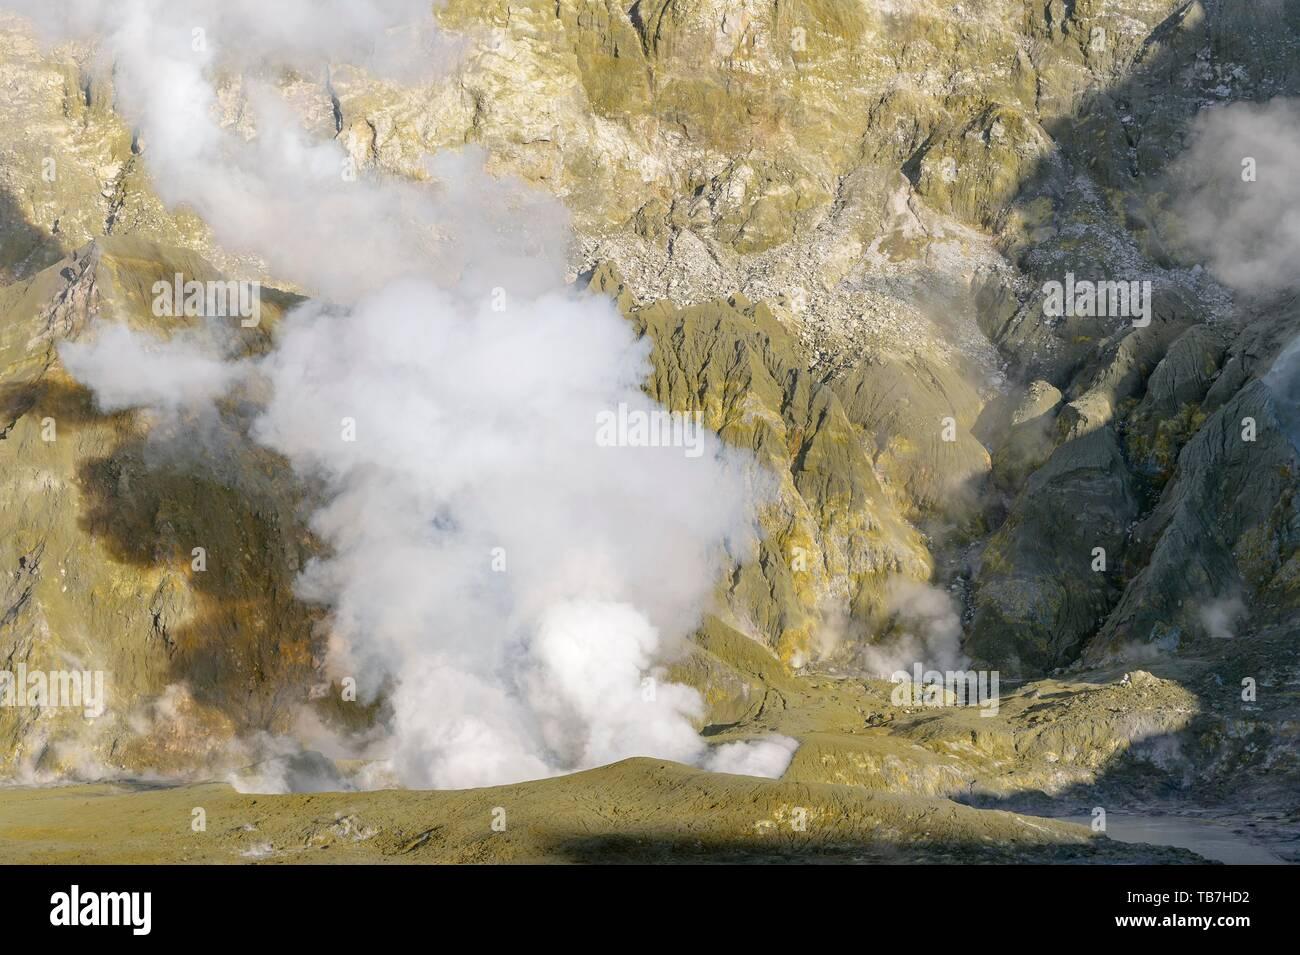 Fumaroles on the volcanic island of White Island, Whakaari, Bay of Plenty, North Island, New Zealand - Stock Image